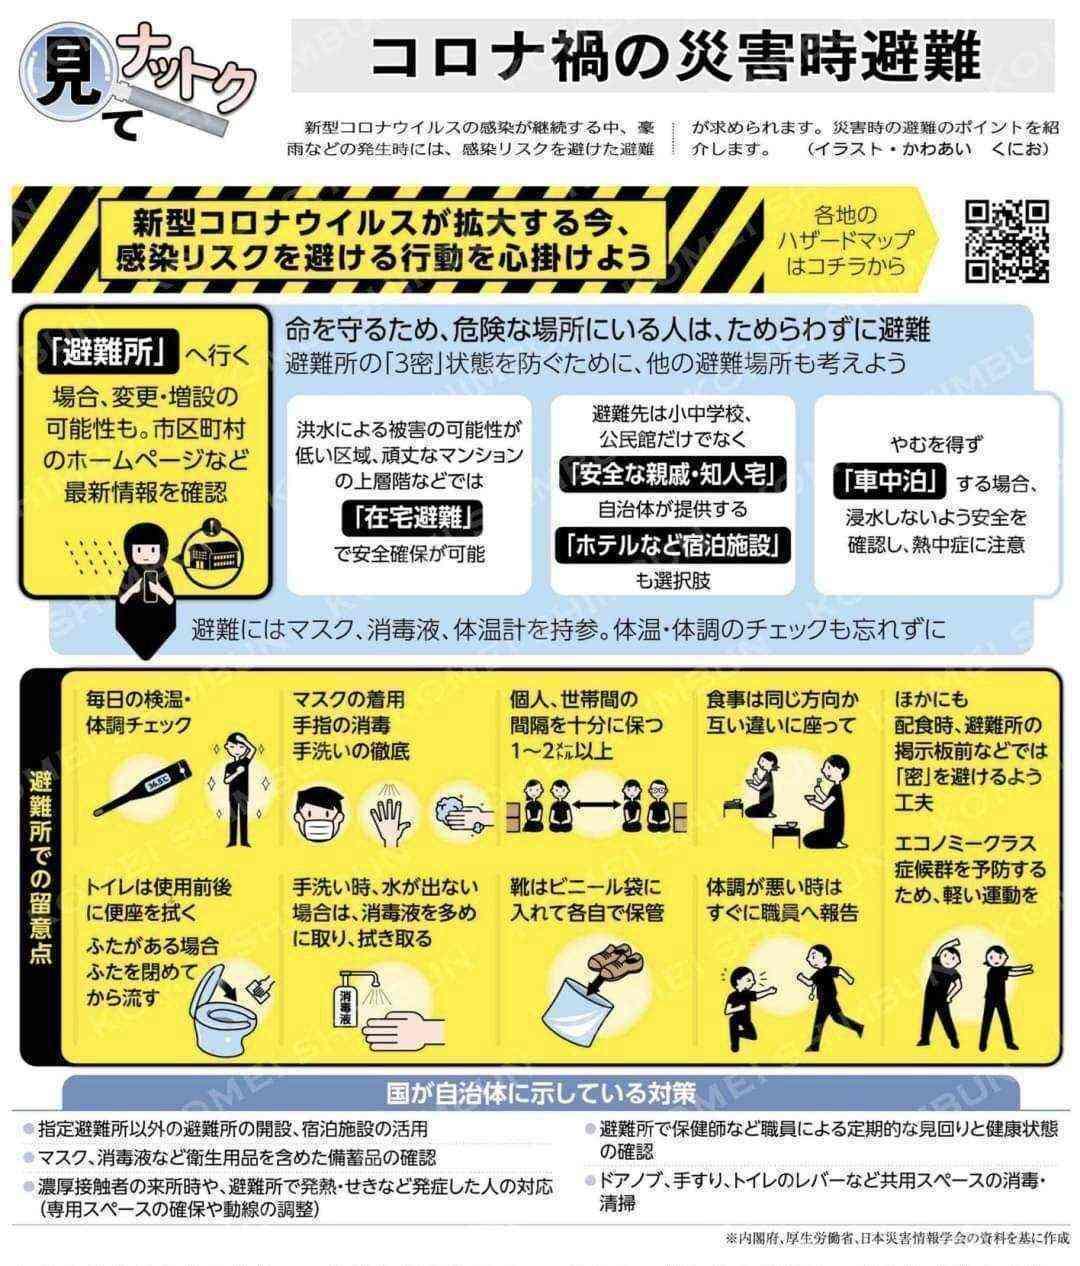 と 避難 勧告 指示 避難